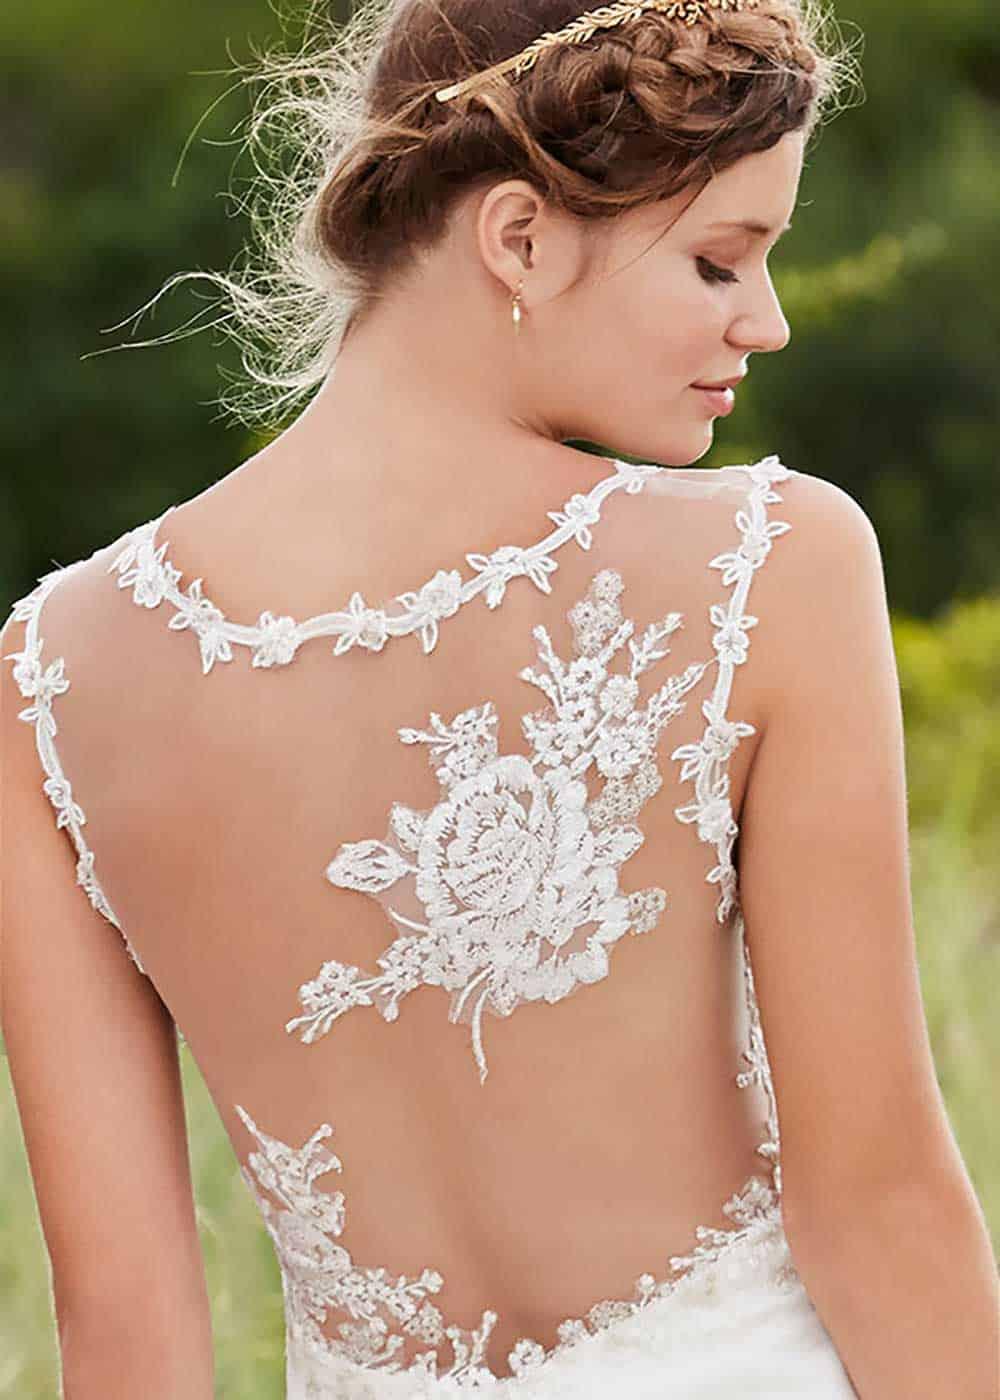 """Rosalie"" sheer back wedding dress from Wendy Makin Bridal Designs."